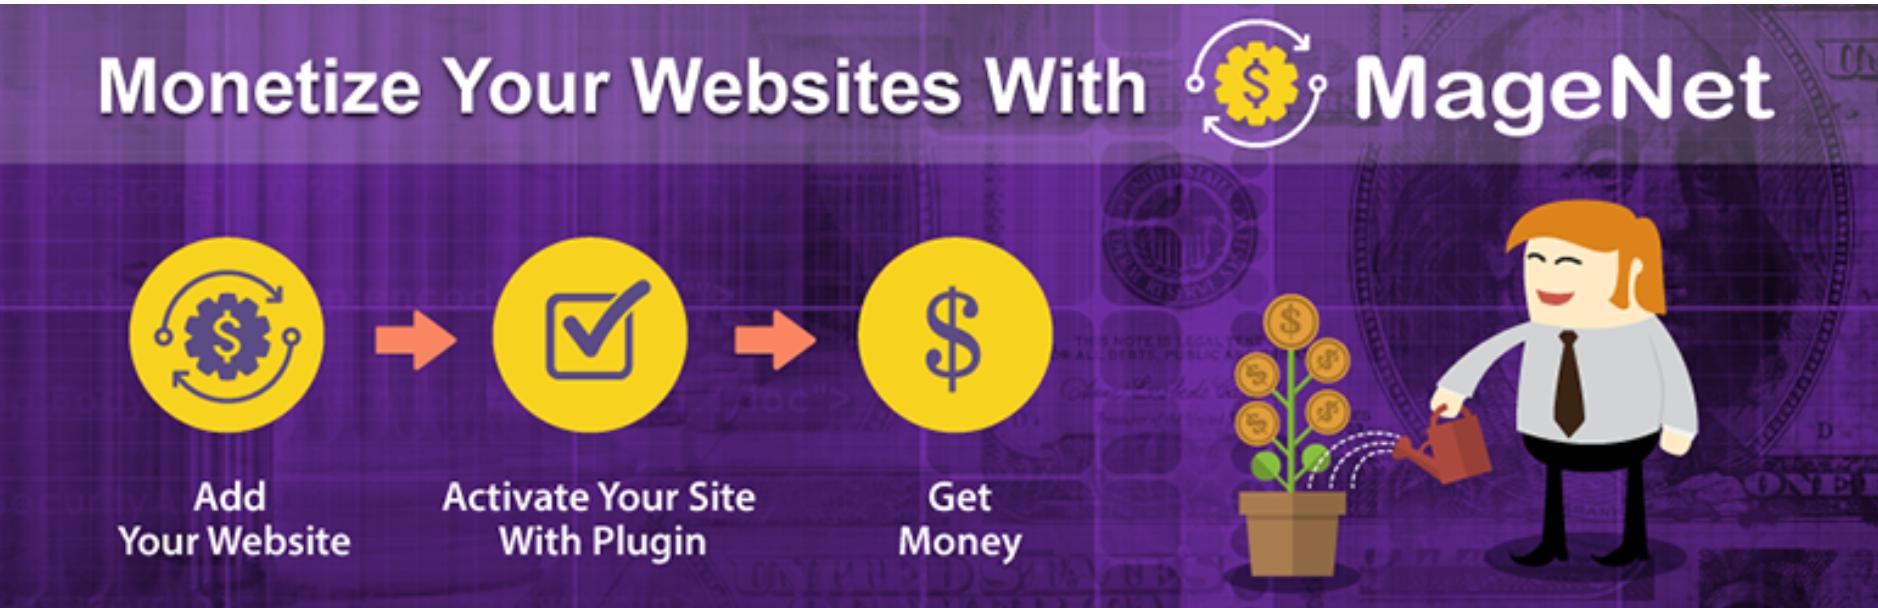 Website Monetization Pluin for MageNet